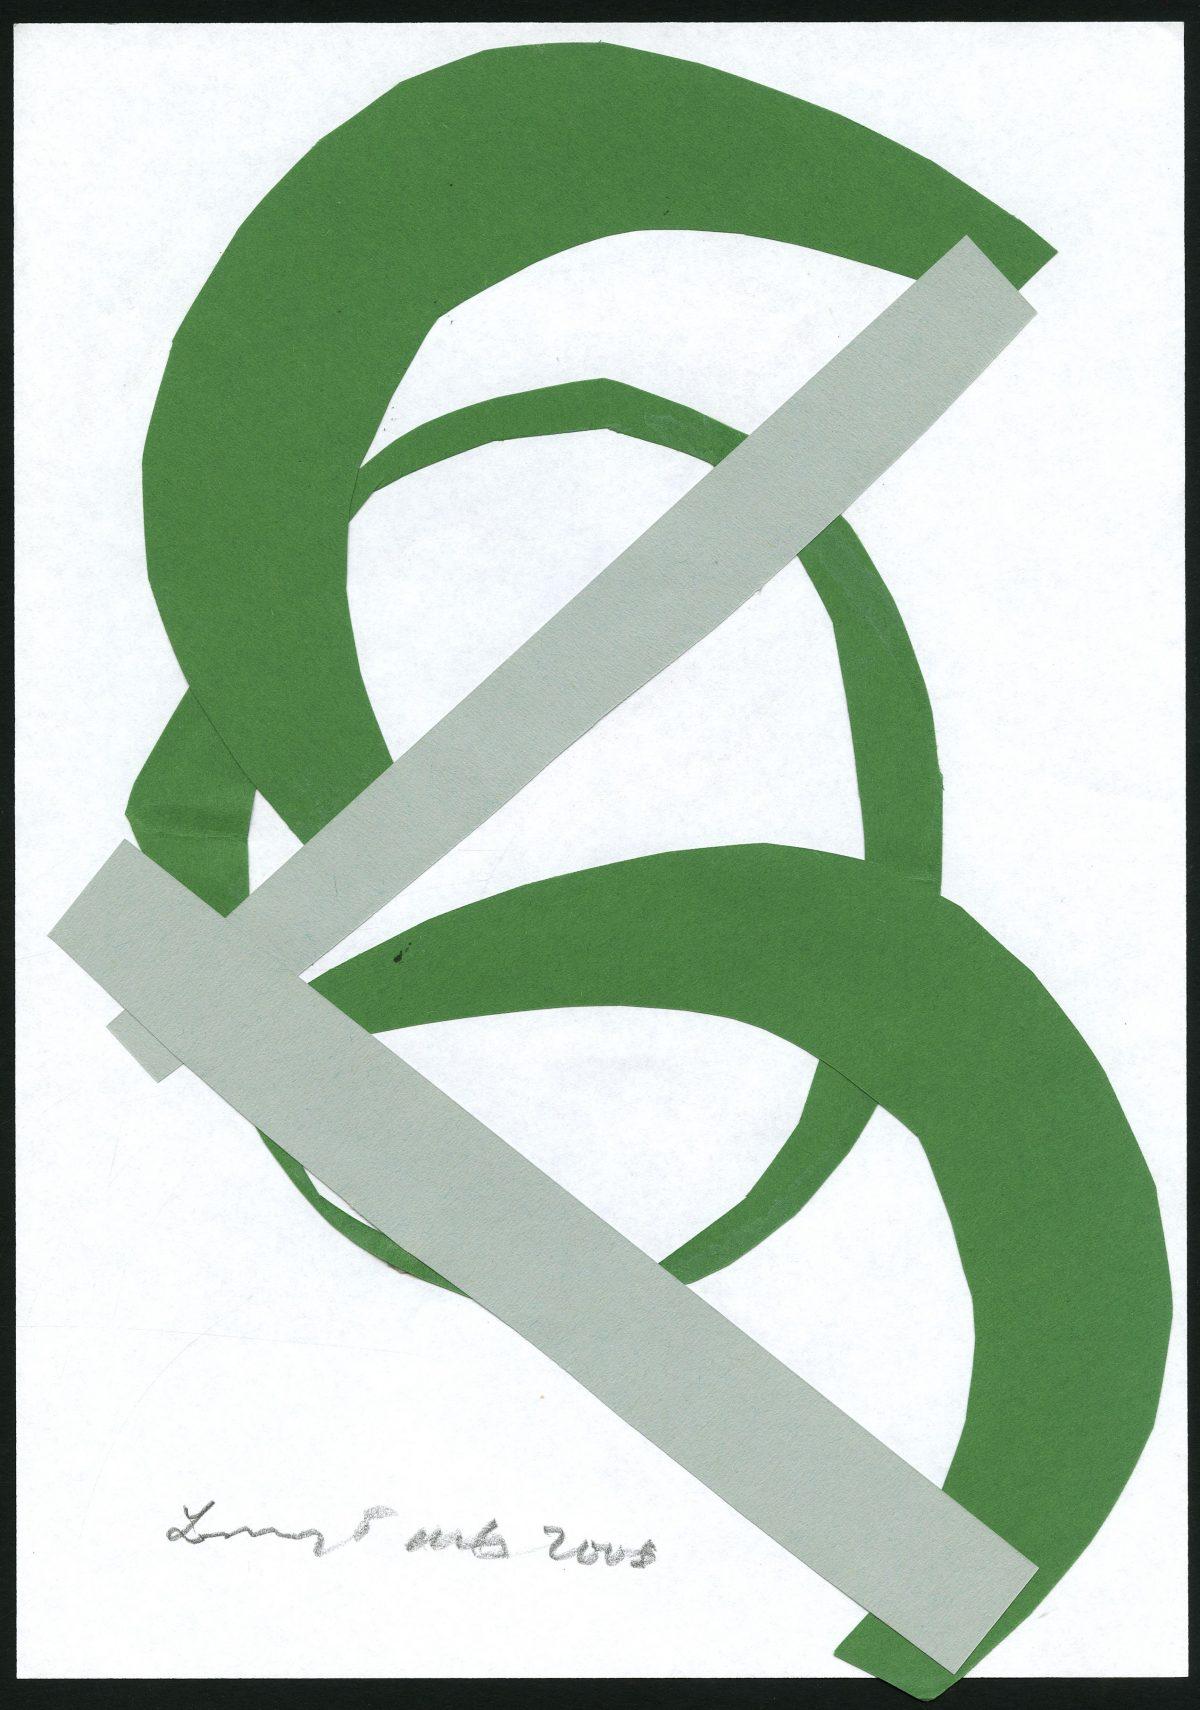 G27696(103)<br/> <b>Cím:</b> Meditációs objektum <br/> <b>Méret cm:</b> 29,8x21 <br/> <b>Készült:</b> 2008. <br/> <b>Technika:</b> kollázs<br/>